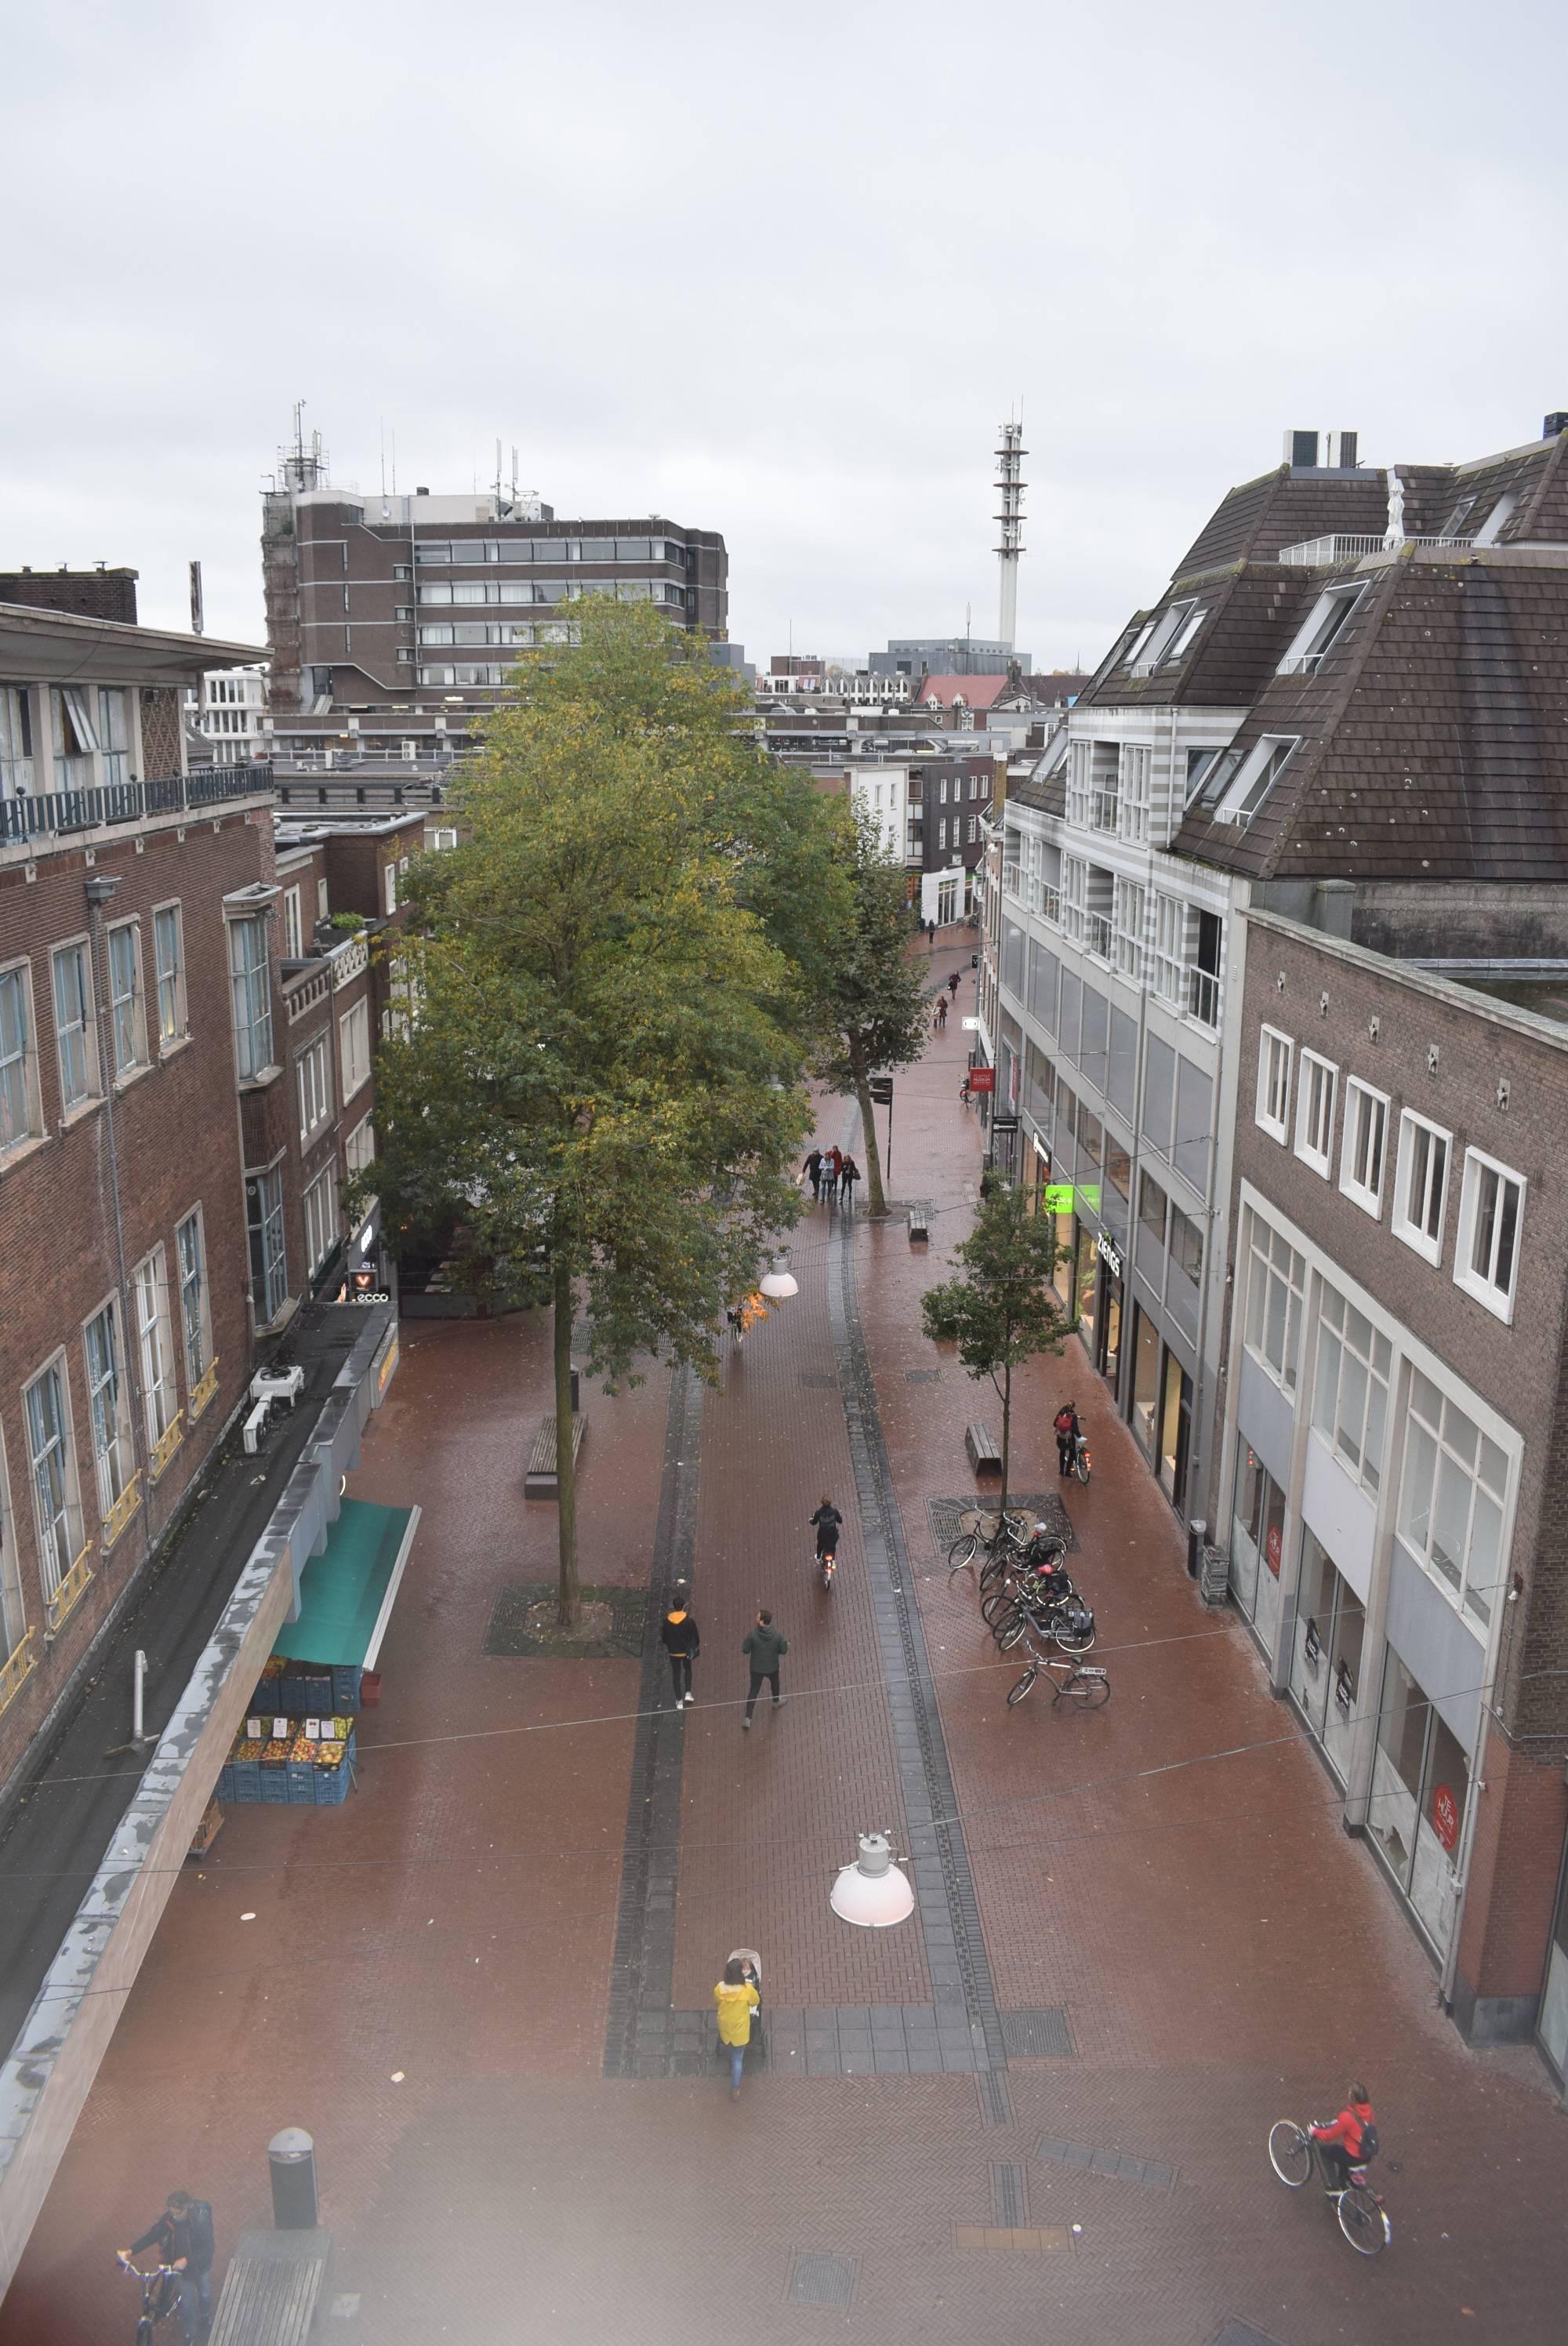 Plein 1944, Nijmegen